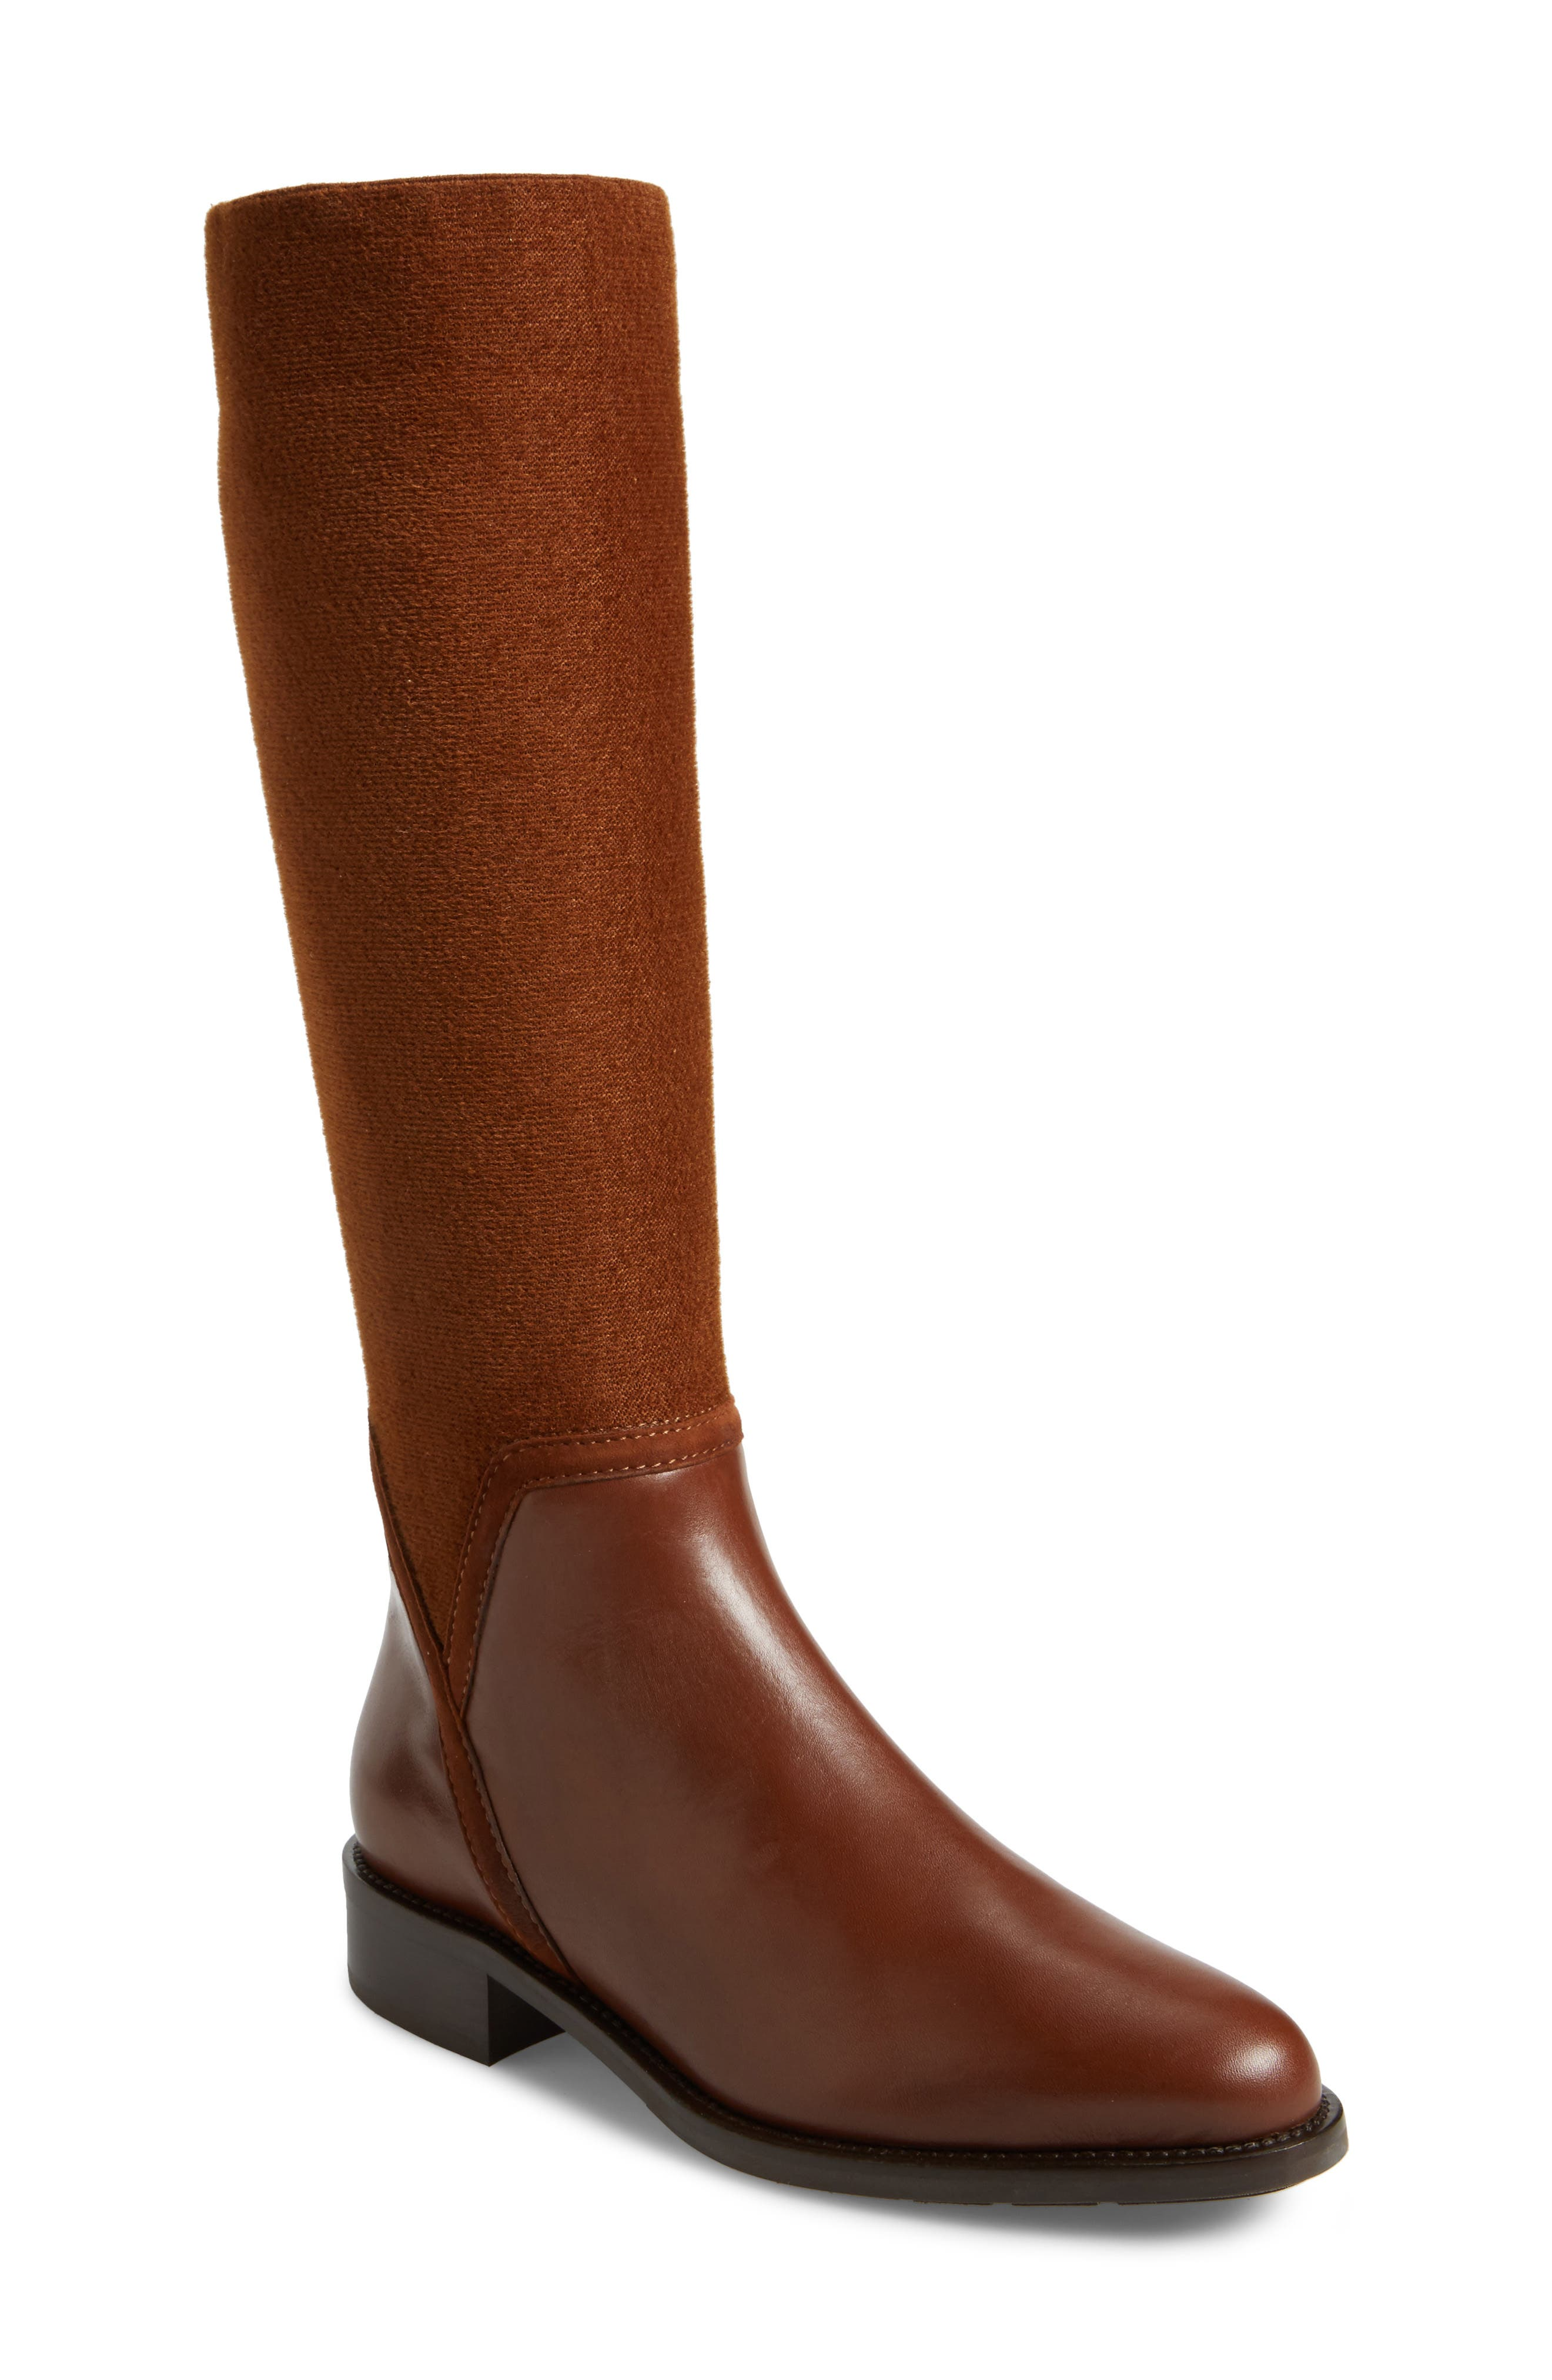 Nicolette Weatherproof Knee High Boot,                             Main thumbnail 1, color,                             Castagno Calf/ Elastic